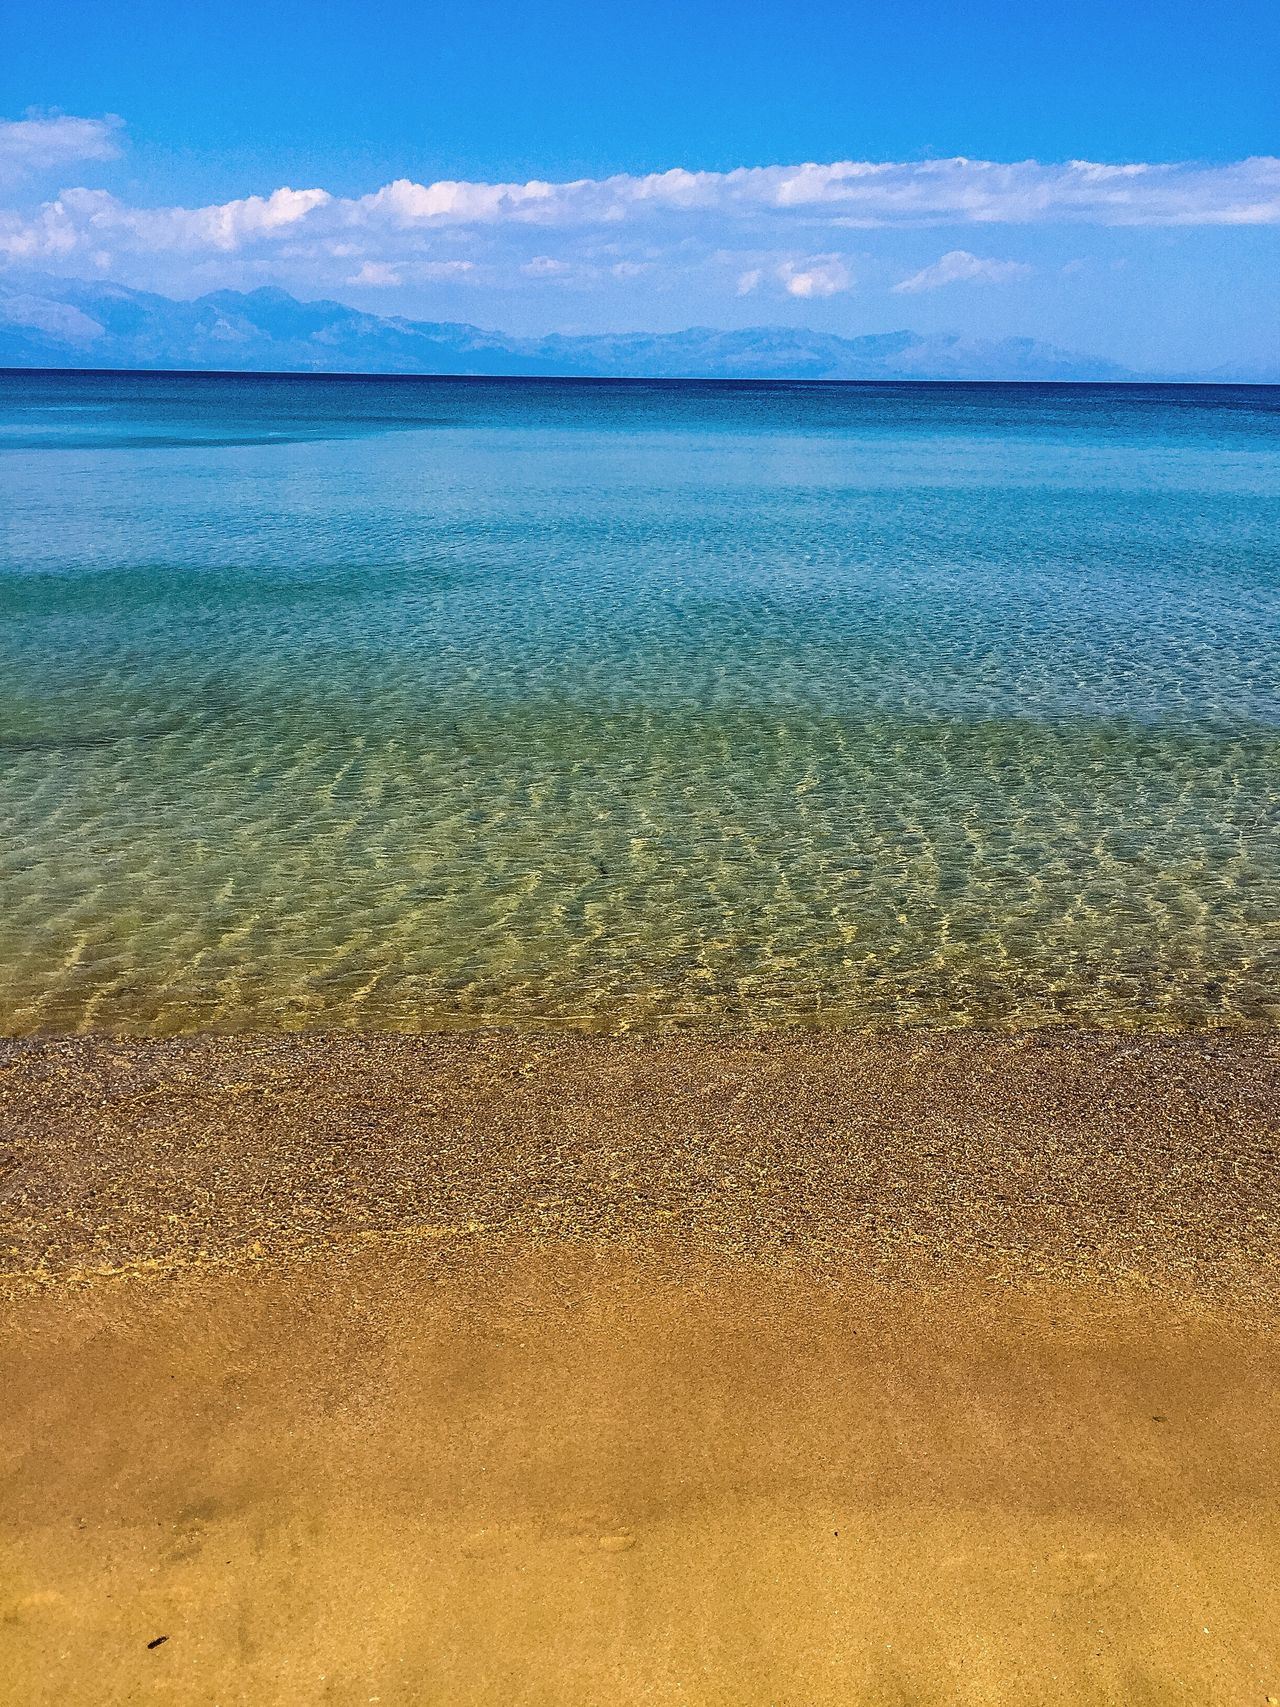 GREECE ♥♥ Greece Kalamata Sea View Blue Blue Sea @photohackday @eyeem Sky_collection Skylovers @eye4photograpy @EyeEmNatureLover EyeEm Best Shots Blue Sky Summertime 43 Golden Moments